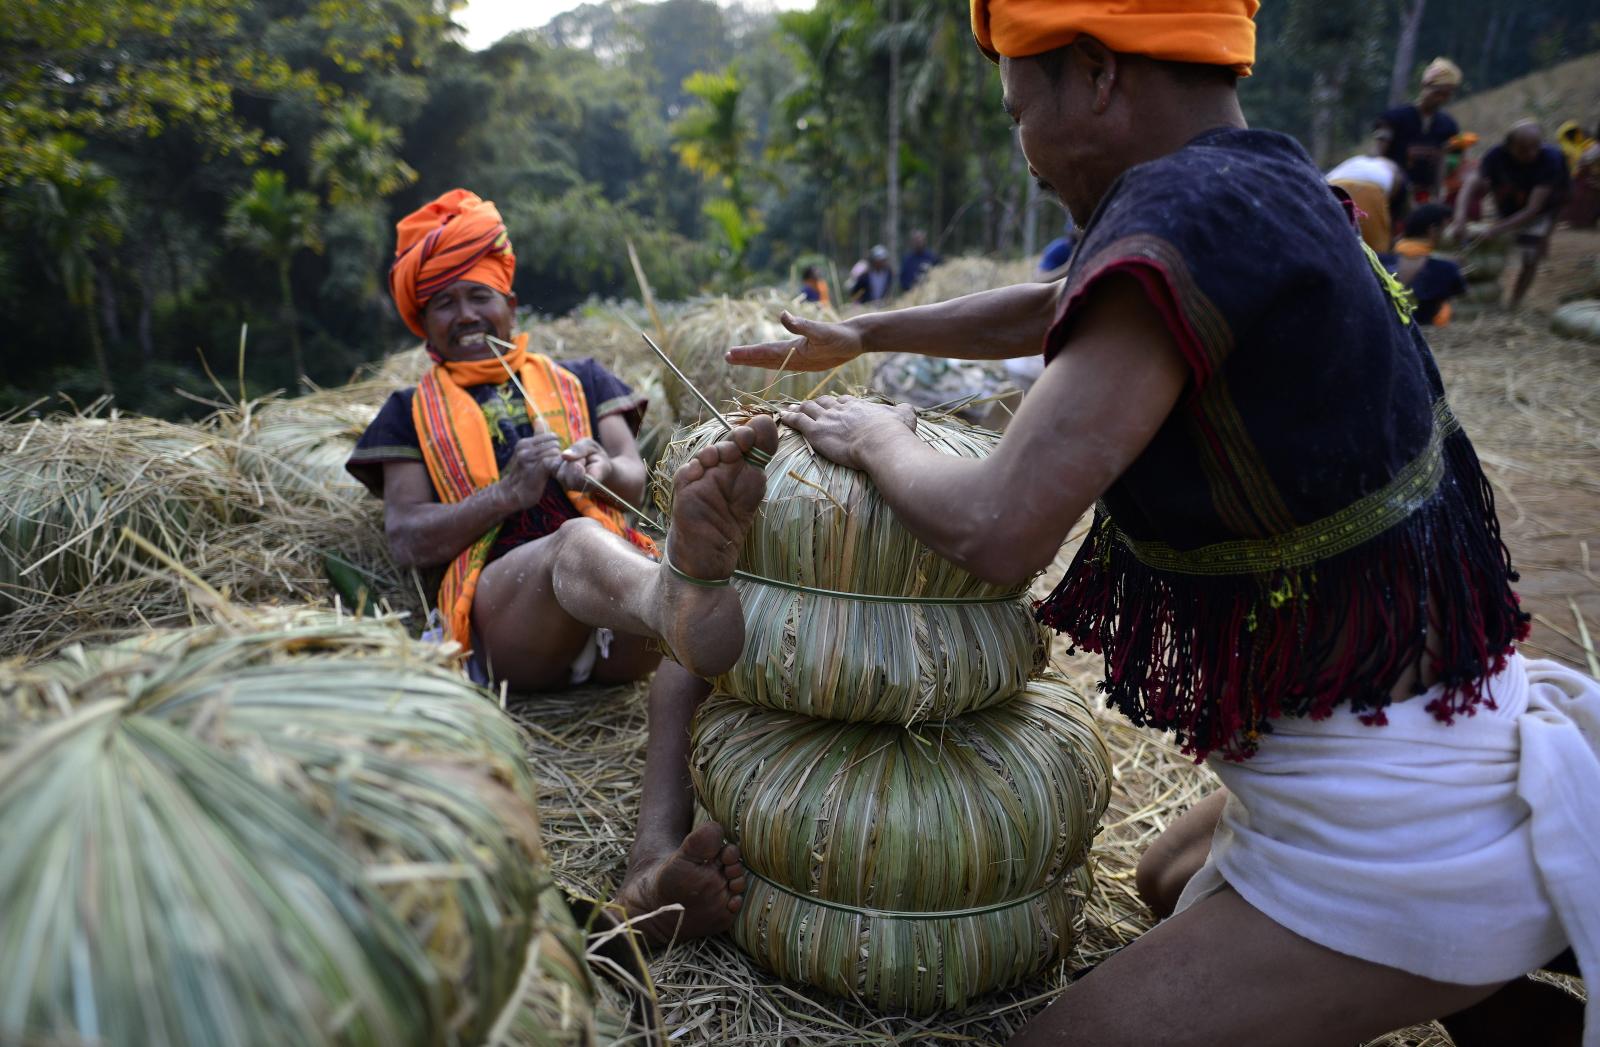 Rolnictwo w Indiach fot. EPA/STR